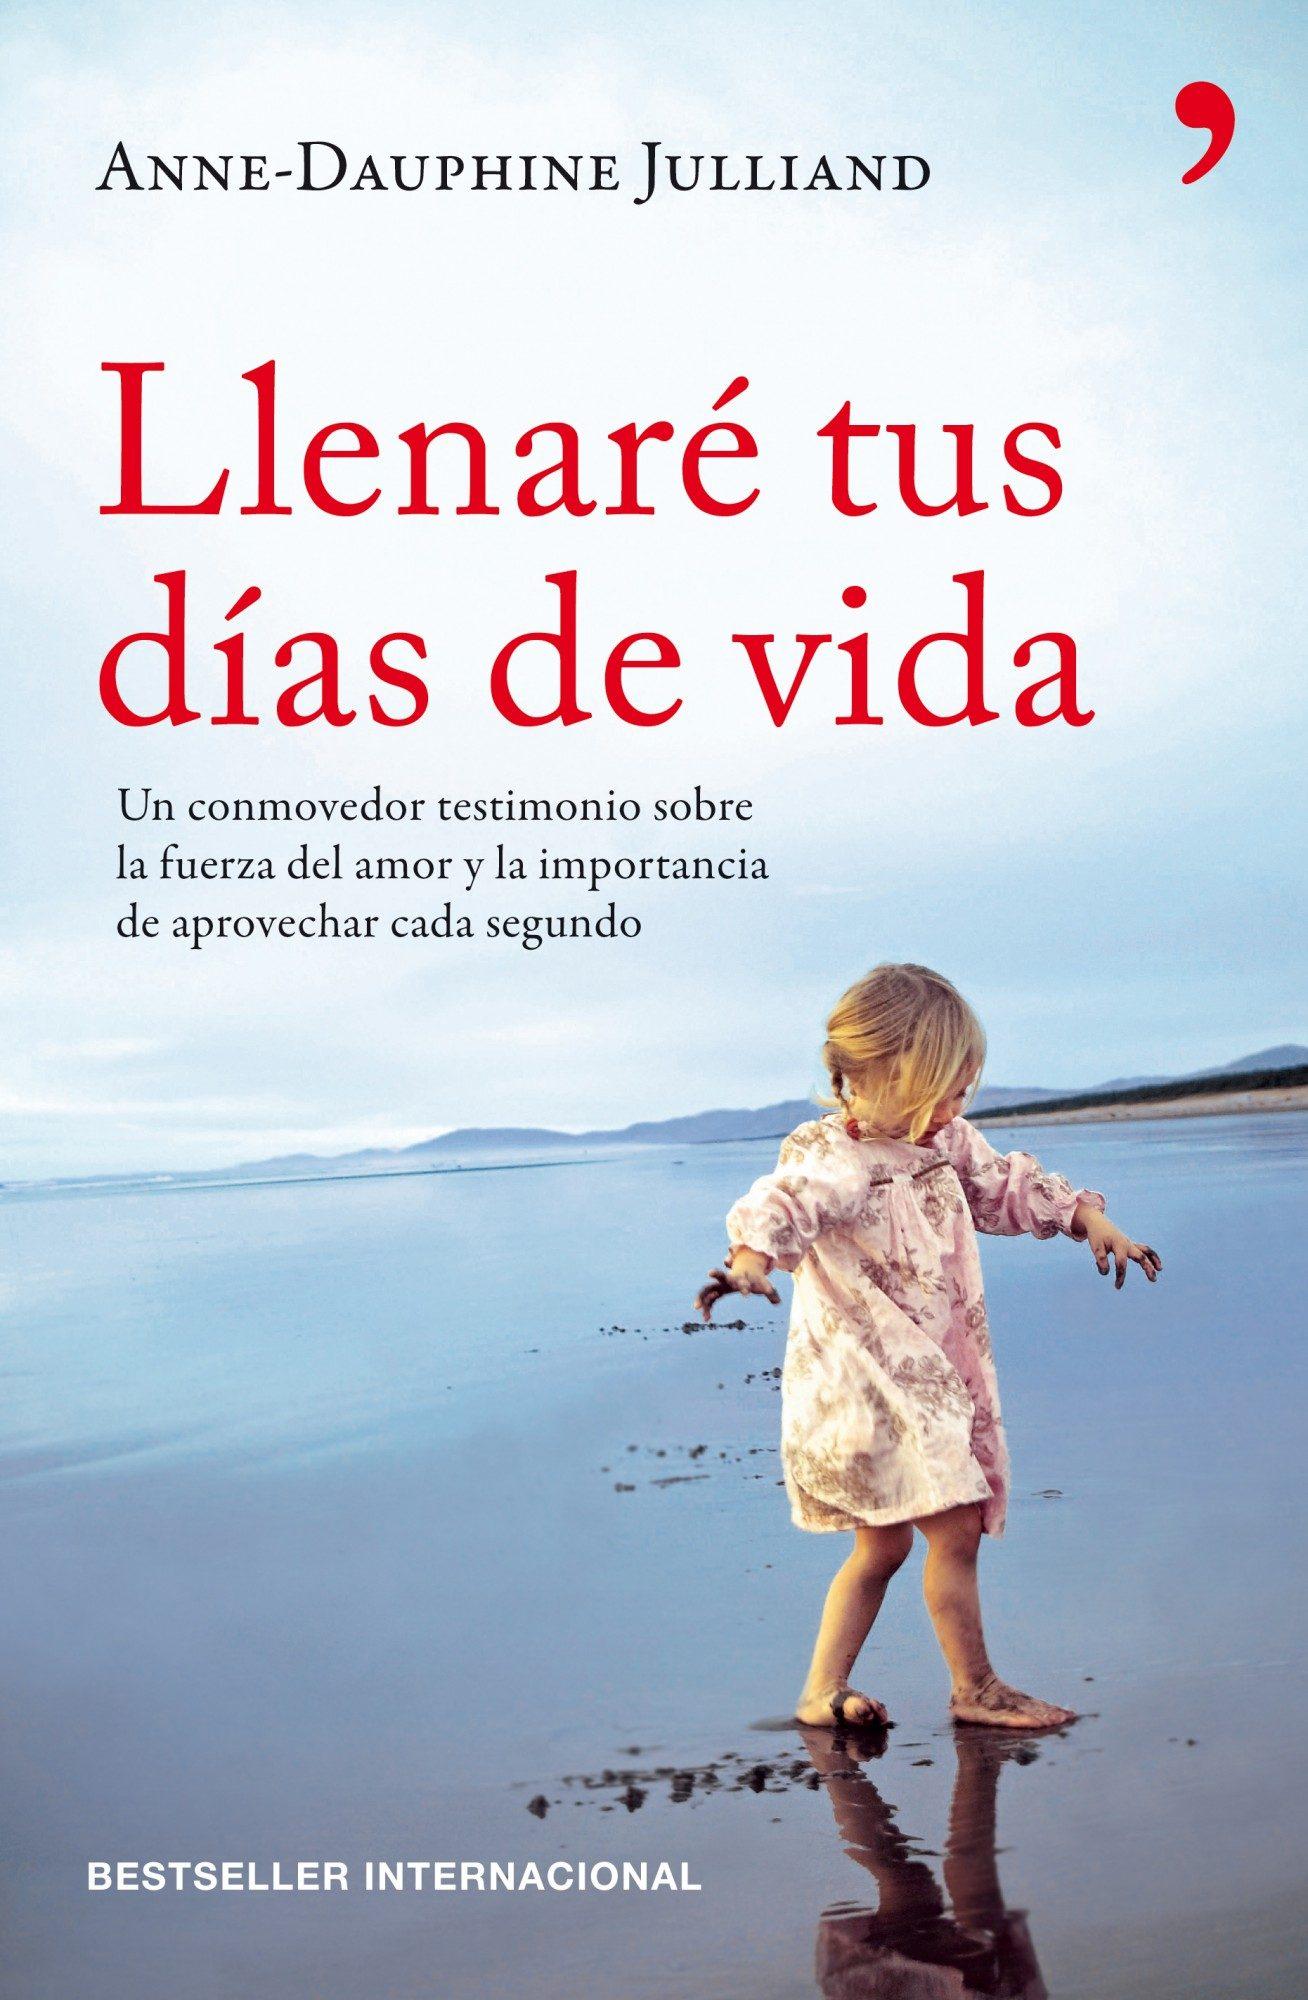 Llenare Tus Dias De Vida Ebook Anne Dauphine Julliand Descargar